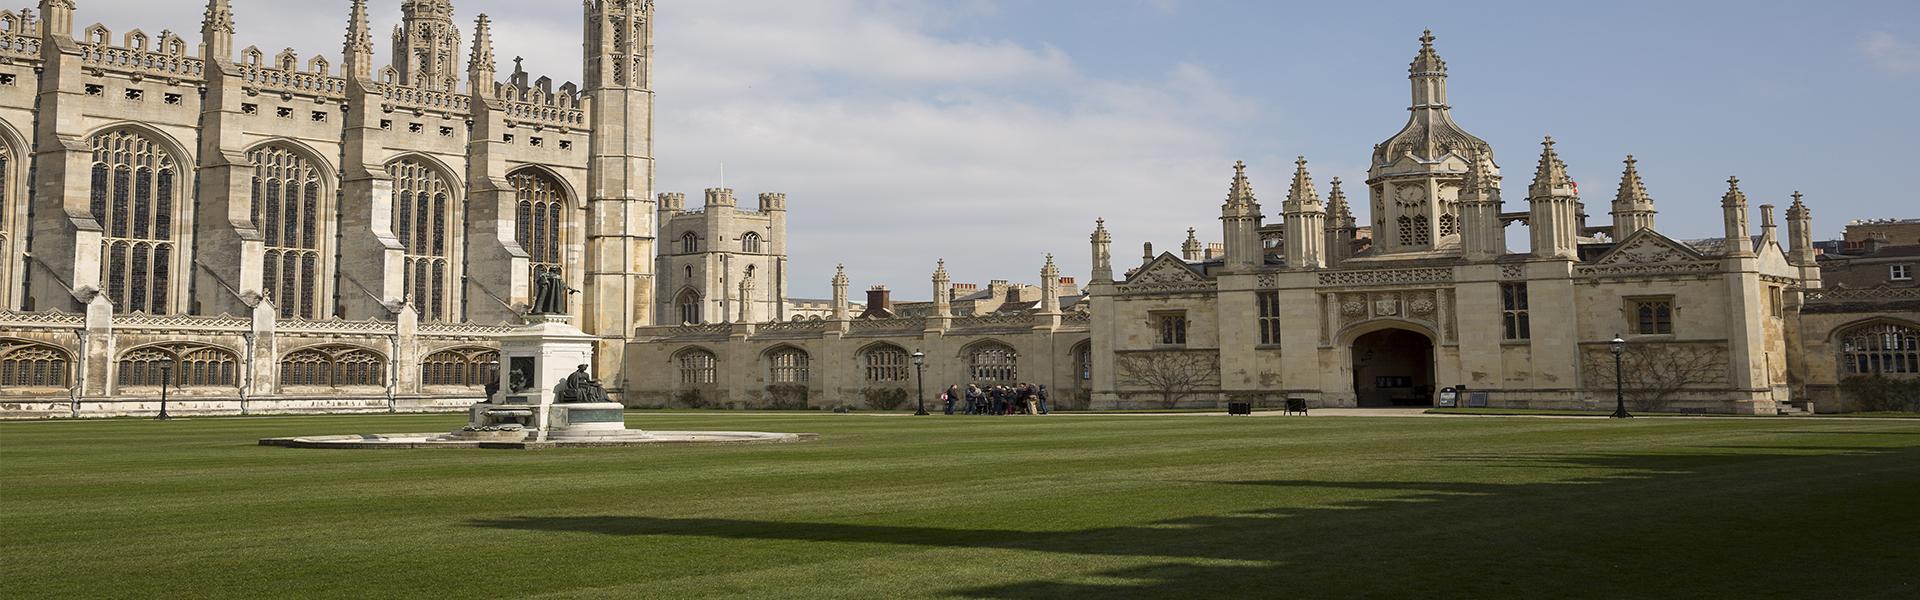 The Cambridge King's College